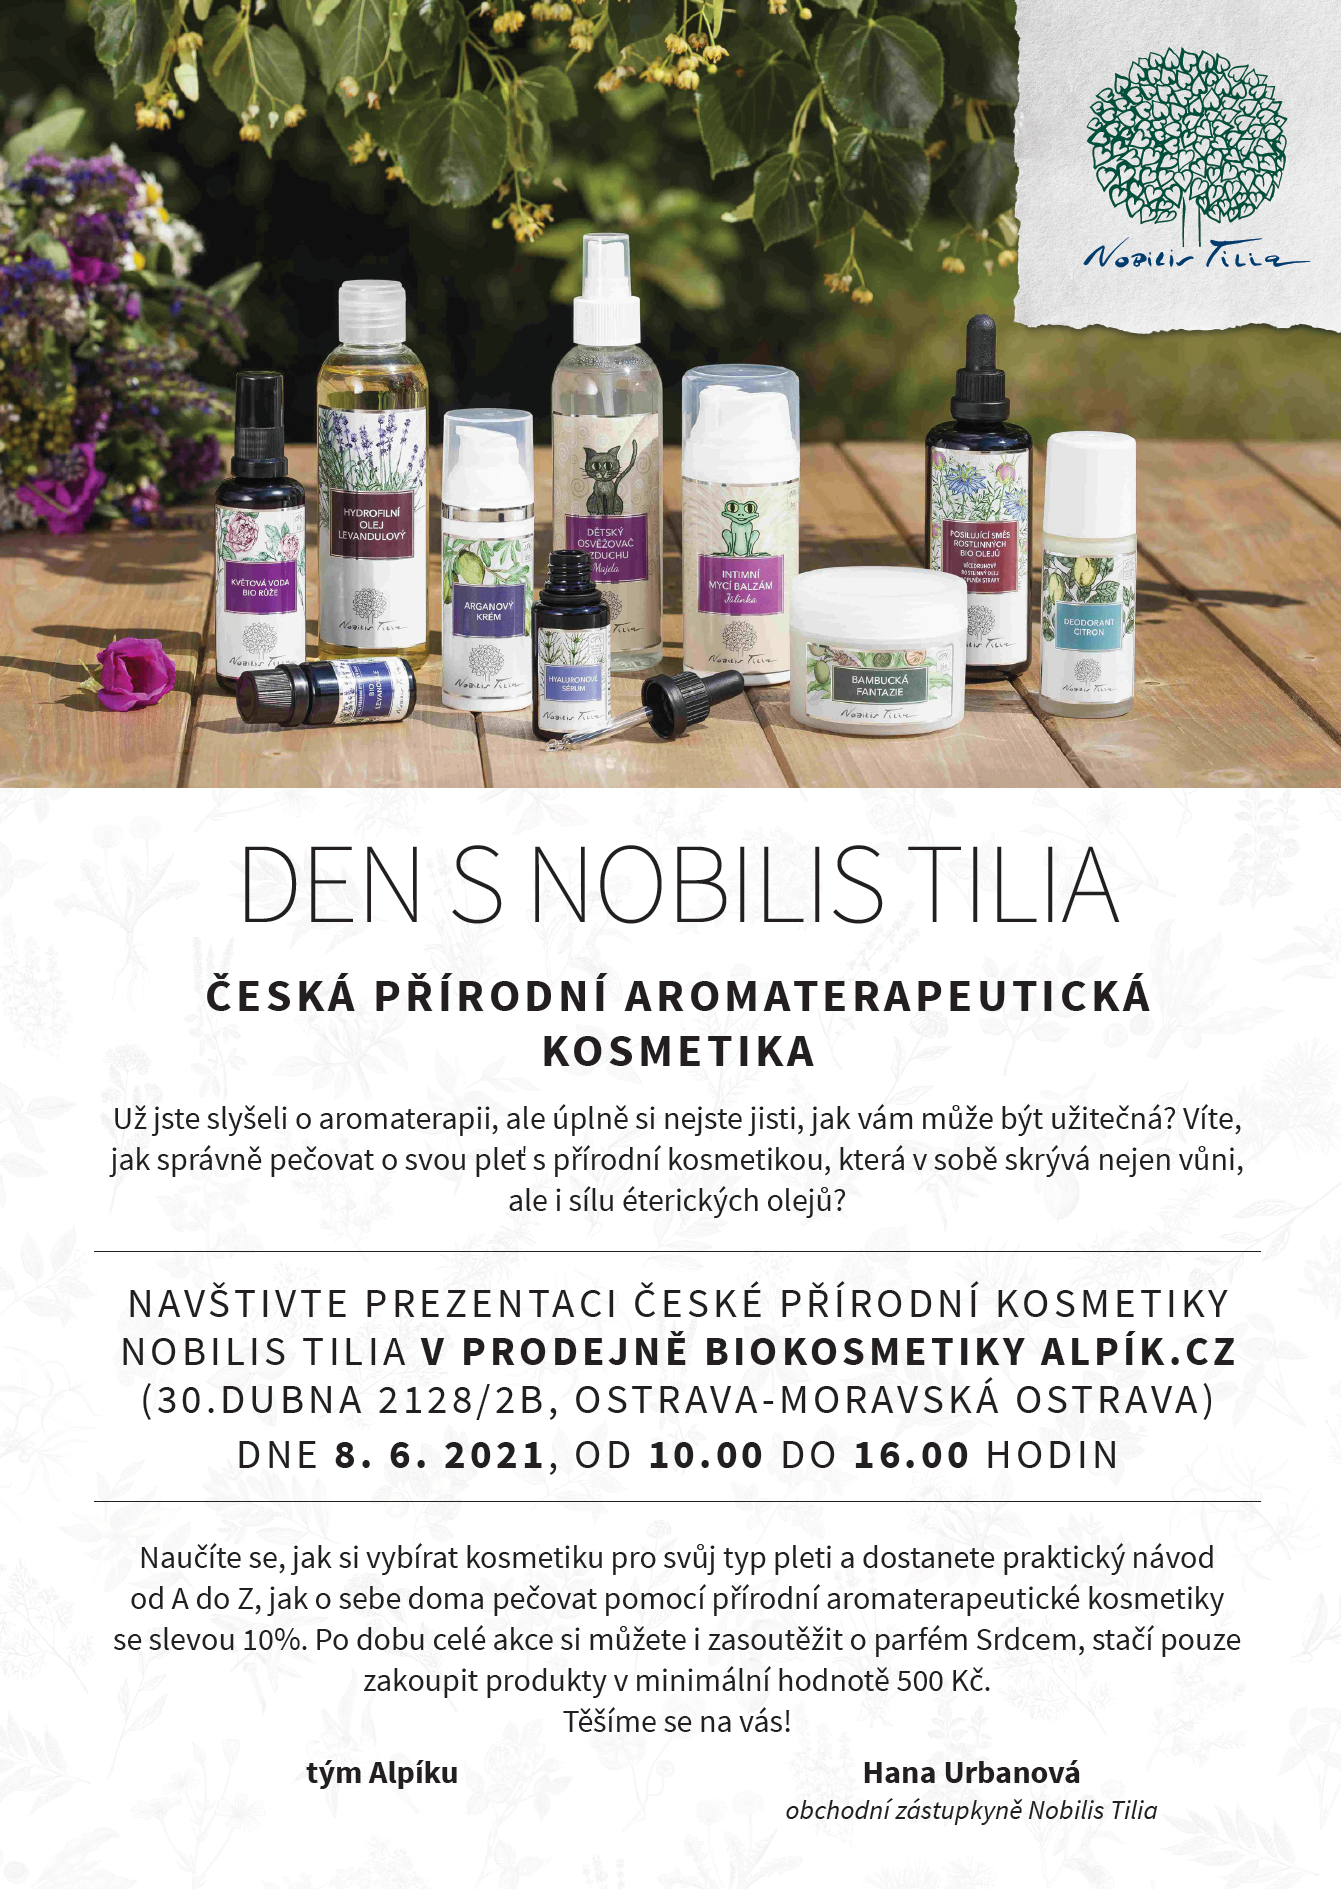 Pozvánka na Den s Nobilis Tilia v Alpik.cz 8.6.